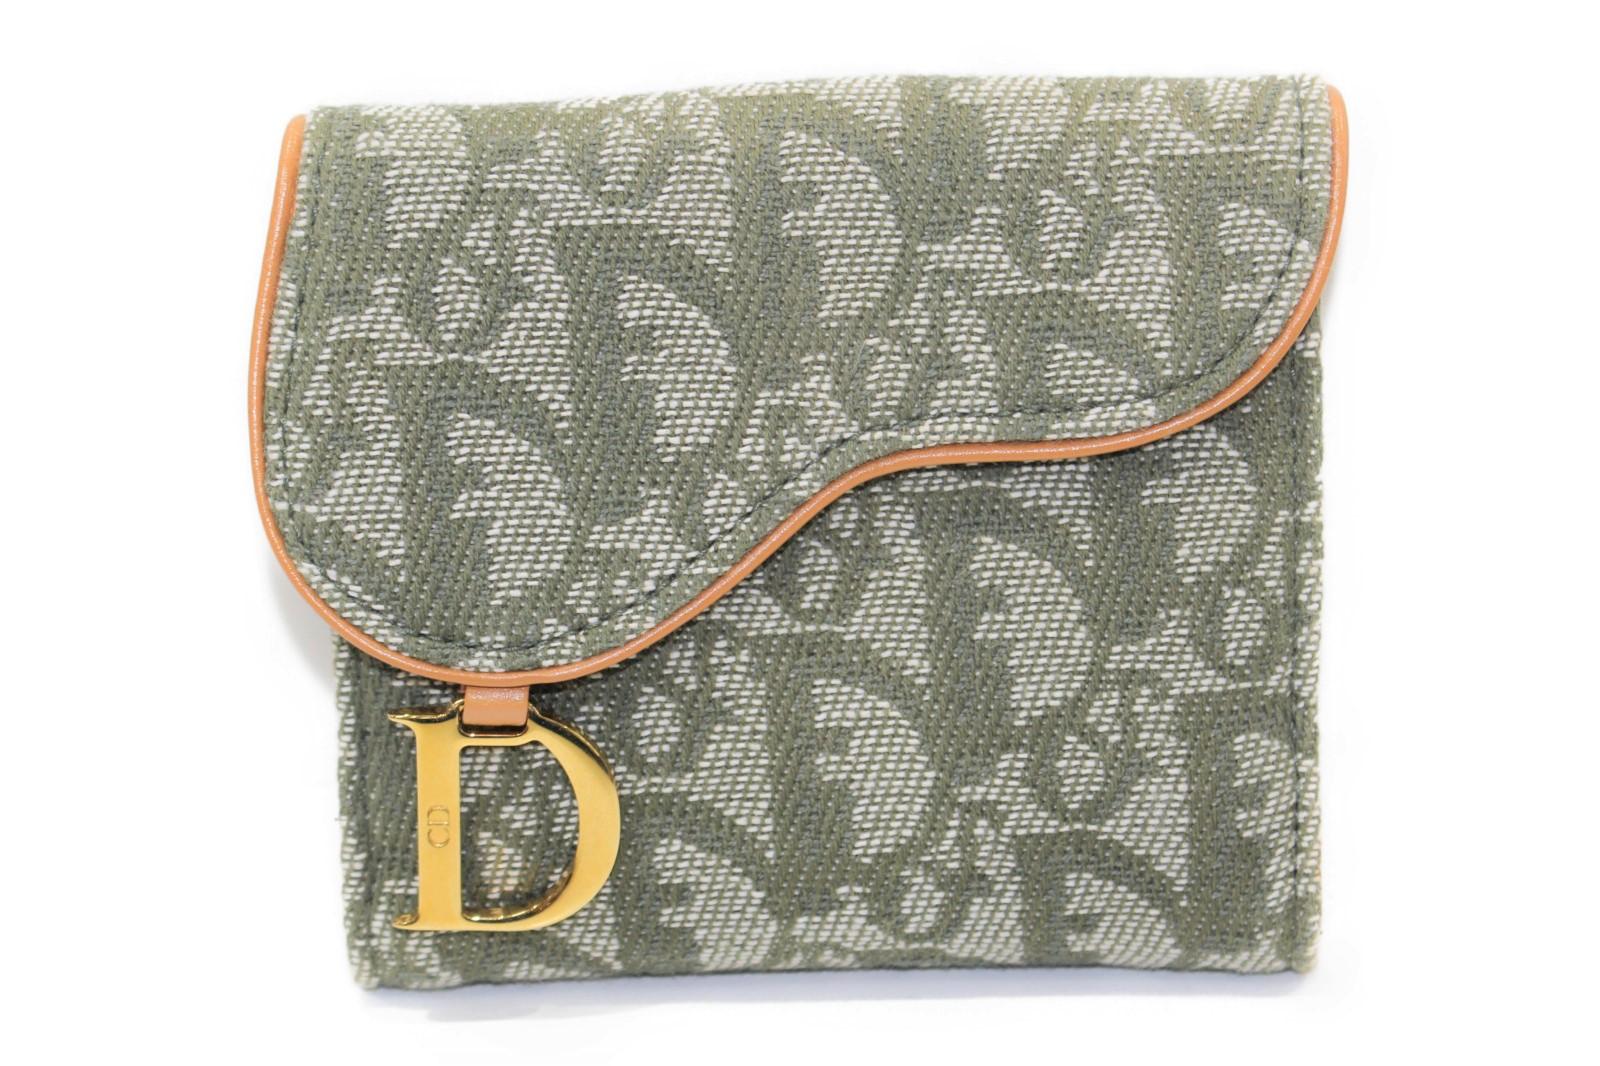 Christian Dior ディオール C.DIOR トロッター Wホック財布 折りたたみ 二つ折り ボタン グリーン系 デニム キャンバス レザー レディース 女性 大人 【中古】